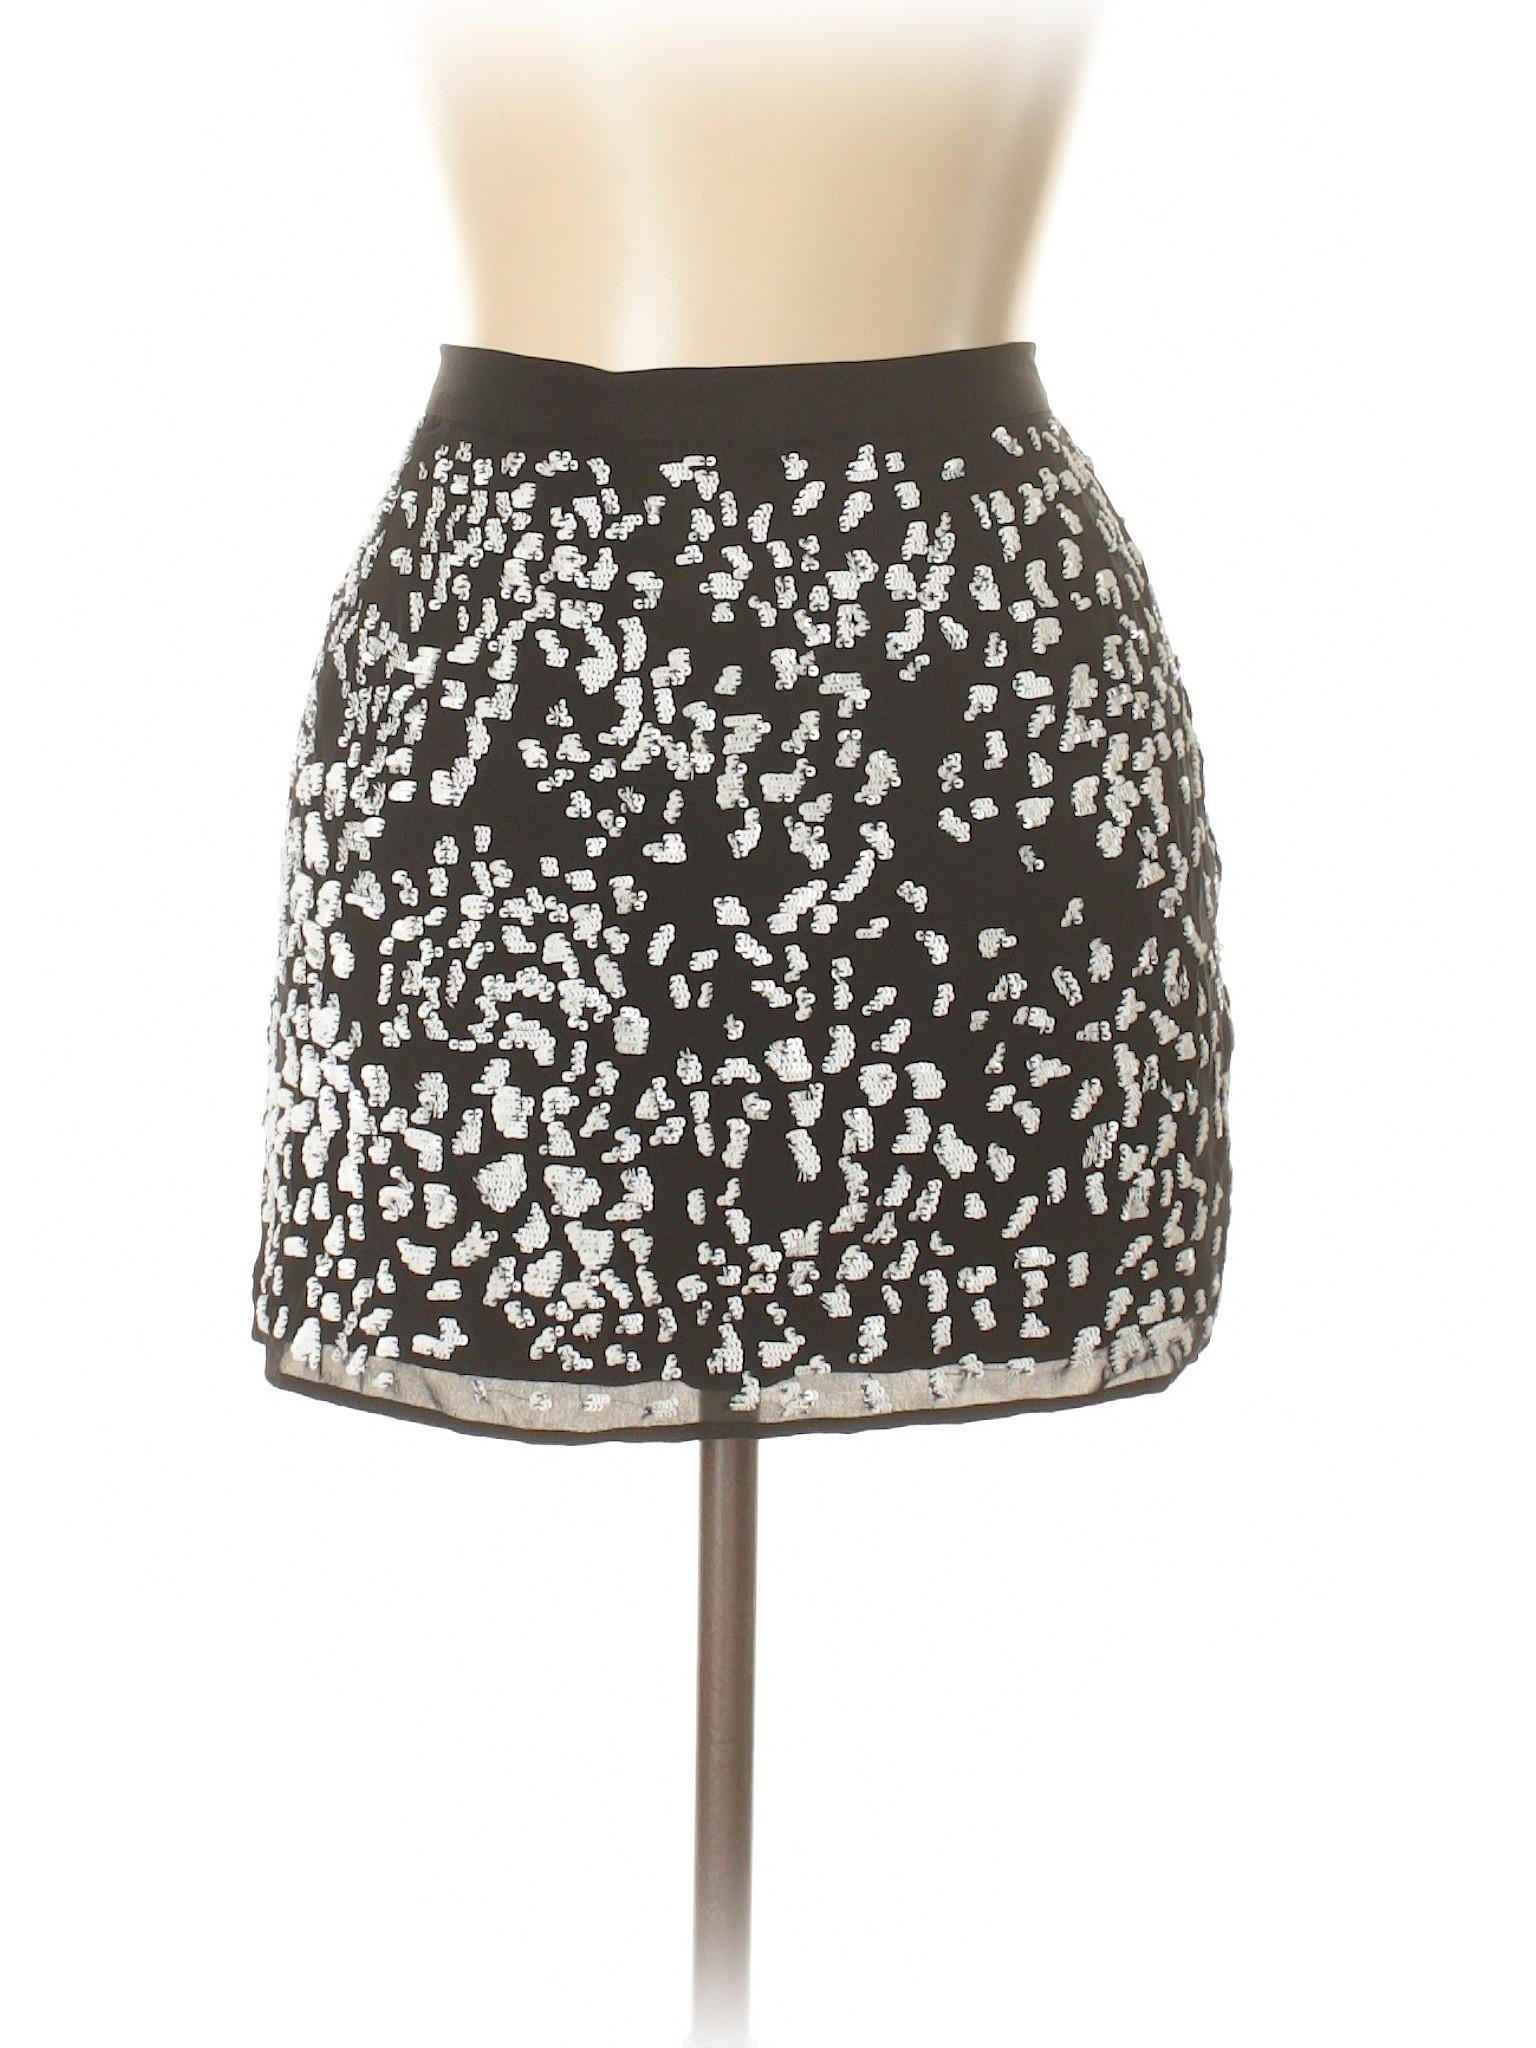 Skirt Skirt Boutique Skirt Casual Skirt Casual Boutique Boutique Casual Boutique Casual qAC6vwq